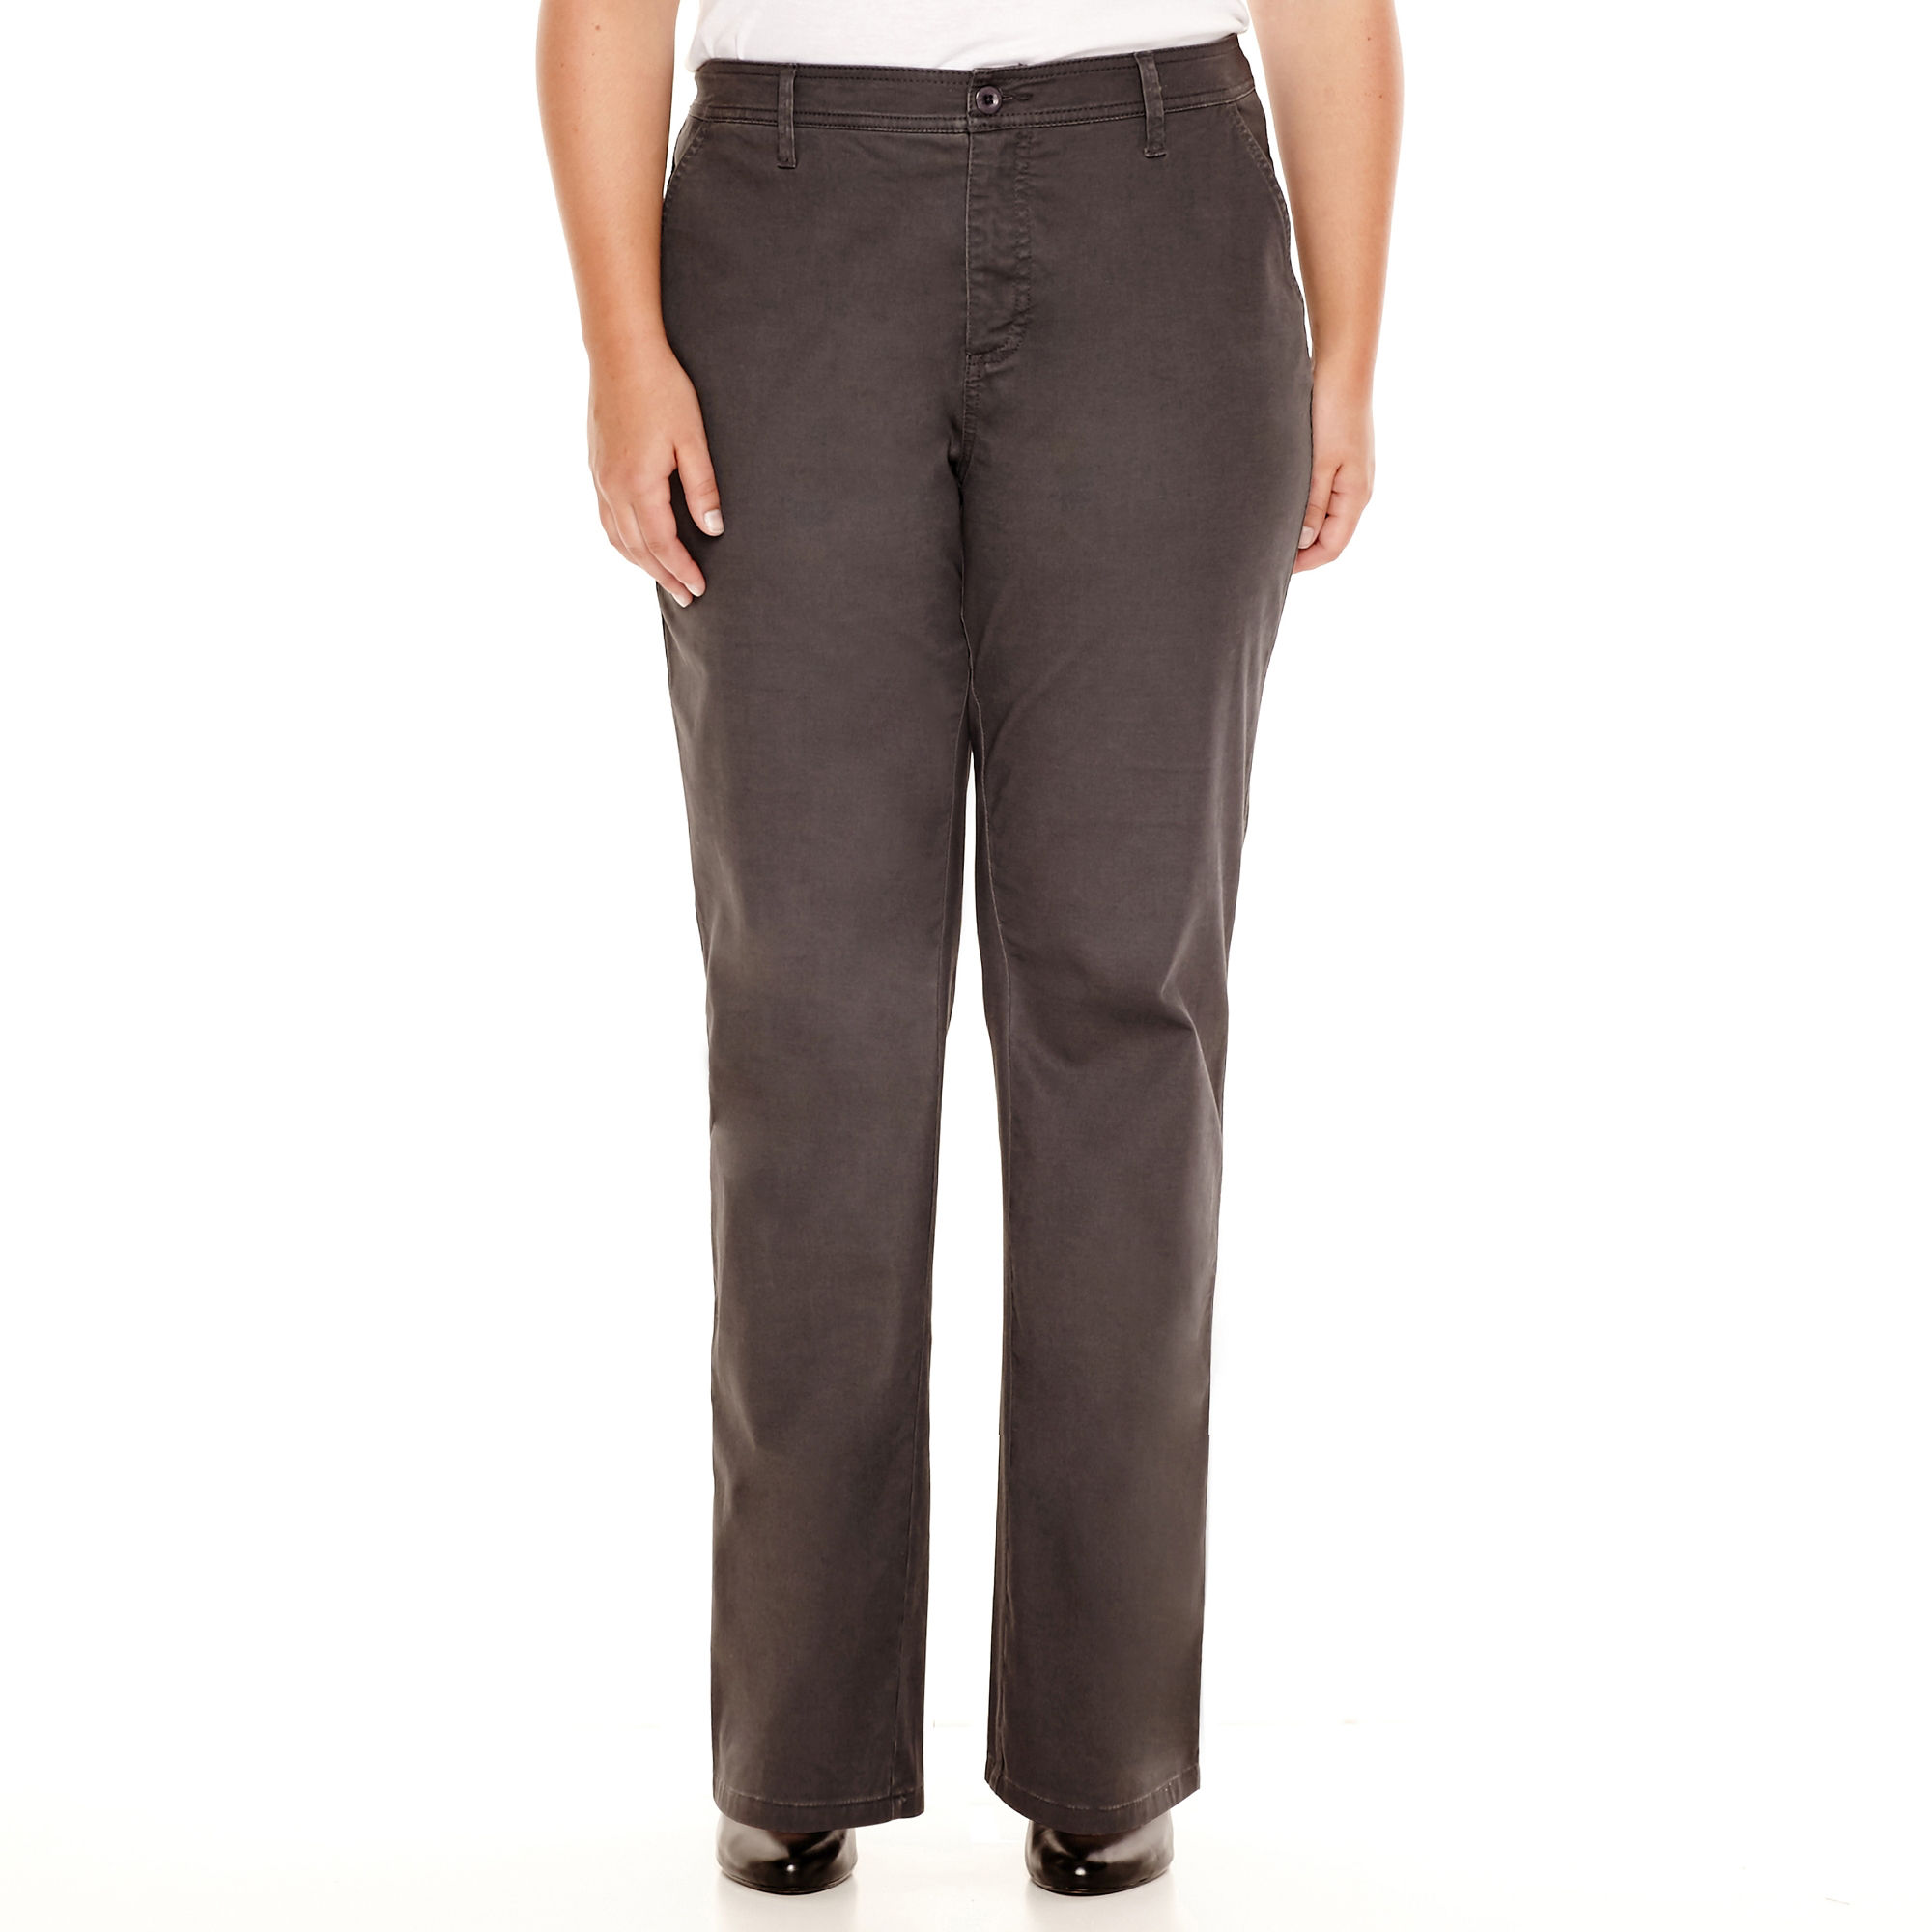 St. John's Bay Bedford Twill Pants - Plus